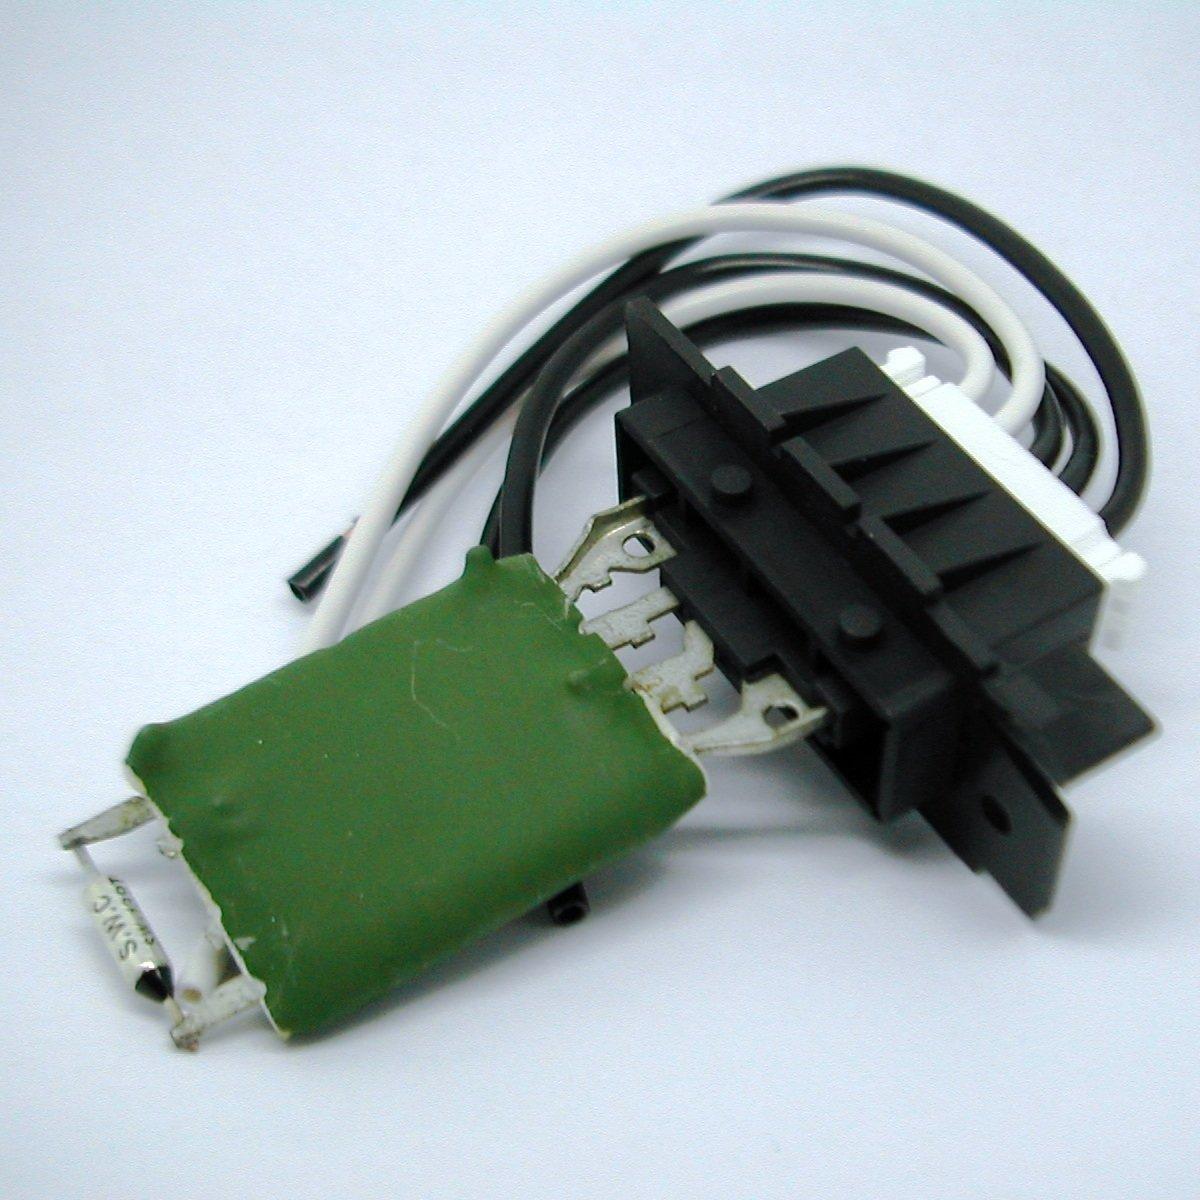 qdi heater blower resistor and wiring harness loom repair kit plug Nissan Wiring Harness ac wiring harness to resistor